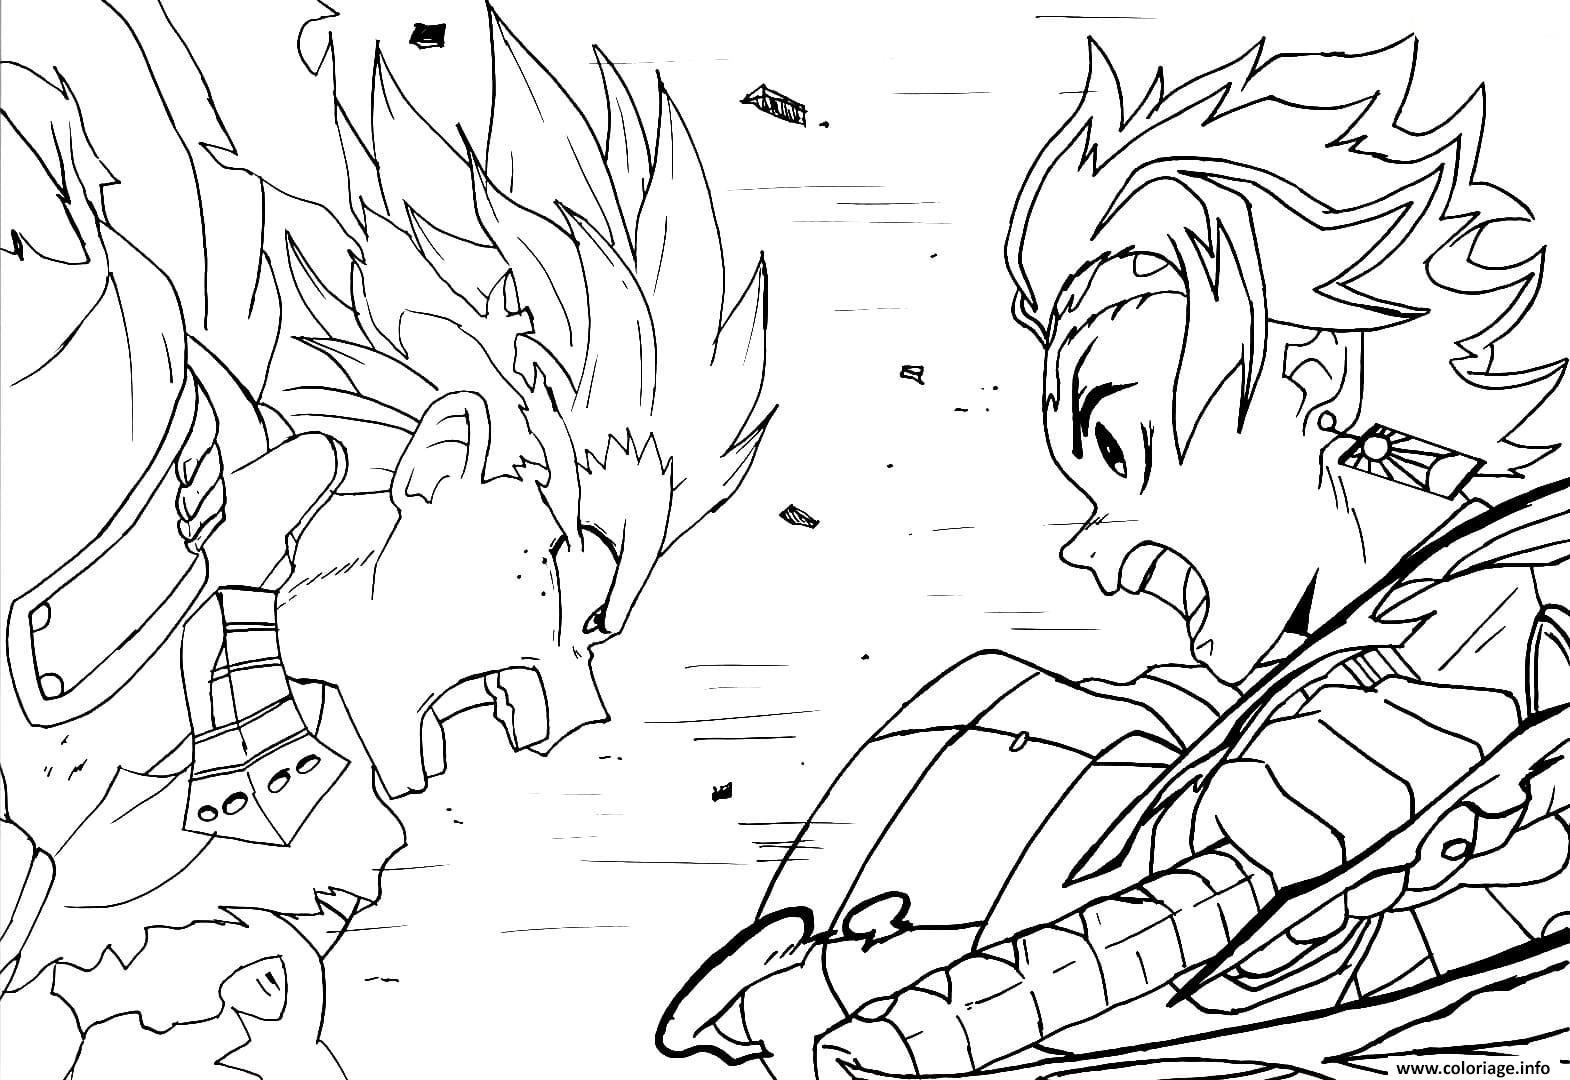 Dessin Deku vs Tanjiro demon slayer Coloriage Gratuit à Imprimer